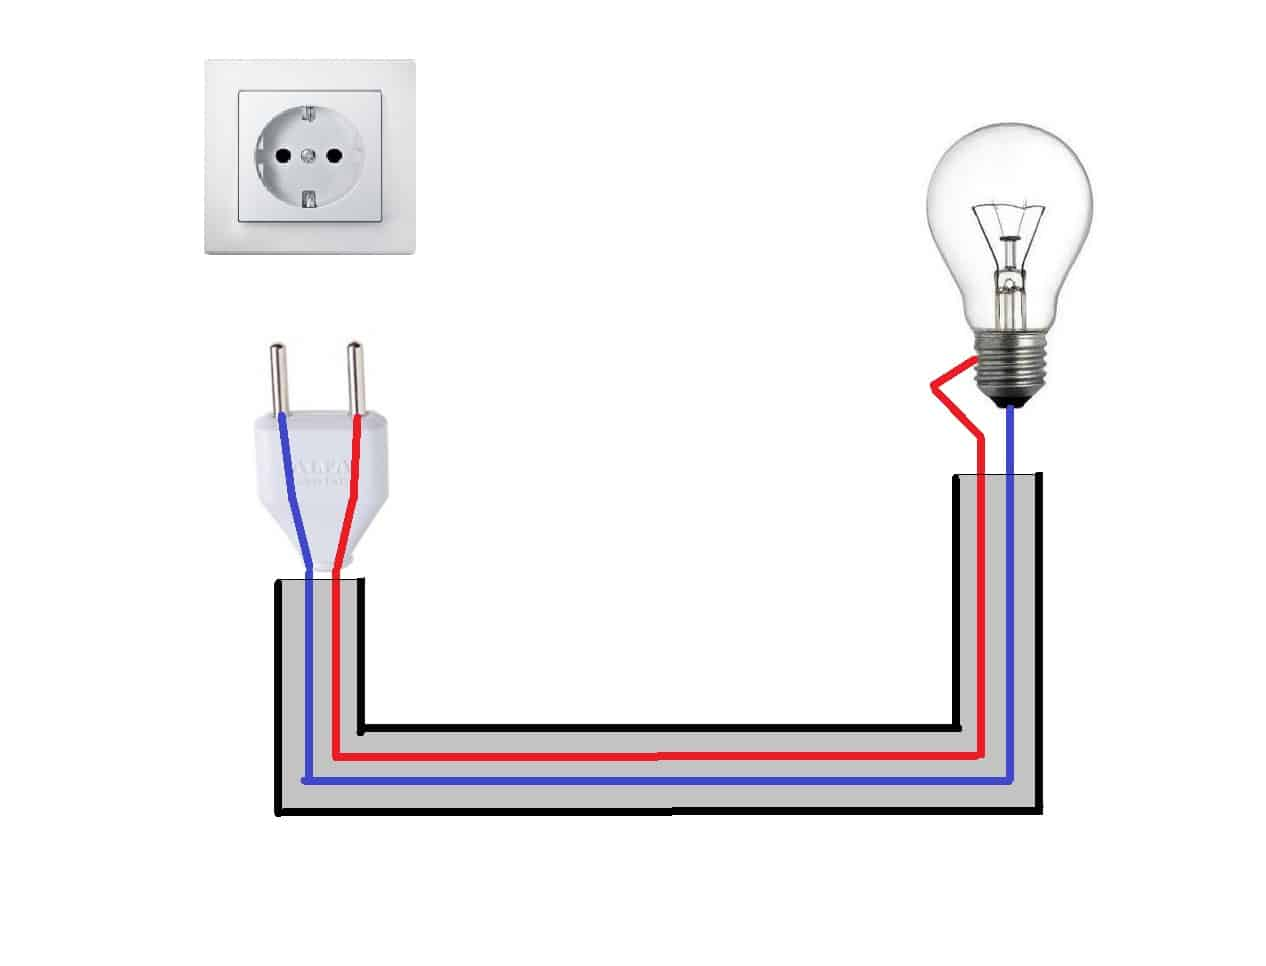 Схема подключения лампочки напрямую